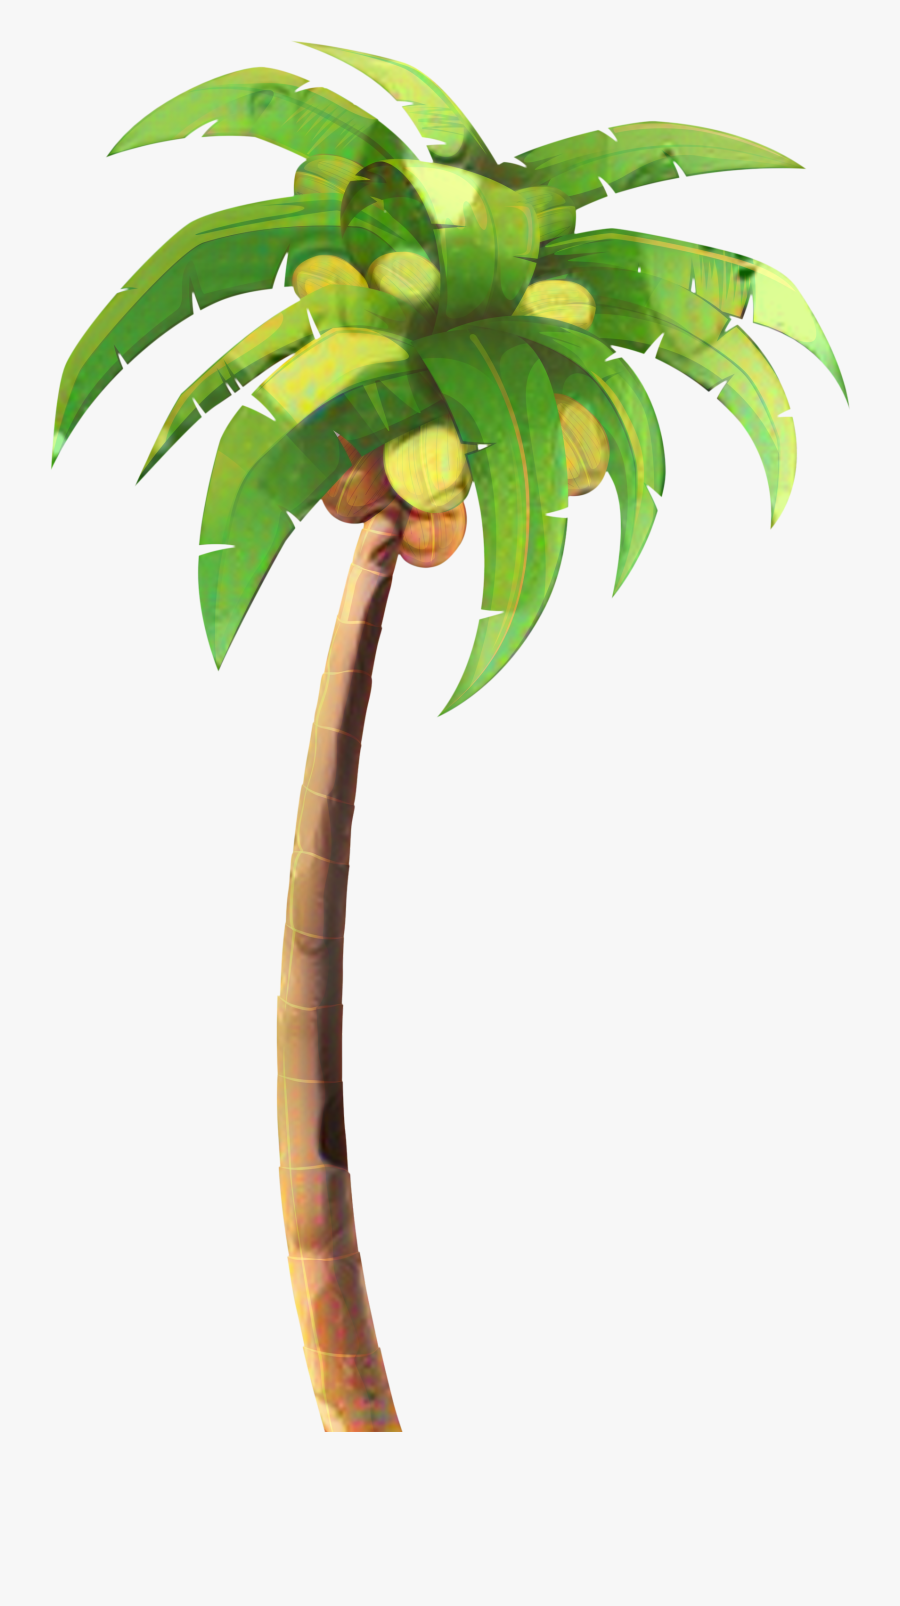 Portable Network Graphics Clip Art Image Palm Trees - Palm Tree Clipart Png, Transparent Clipart